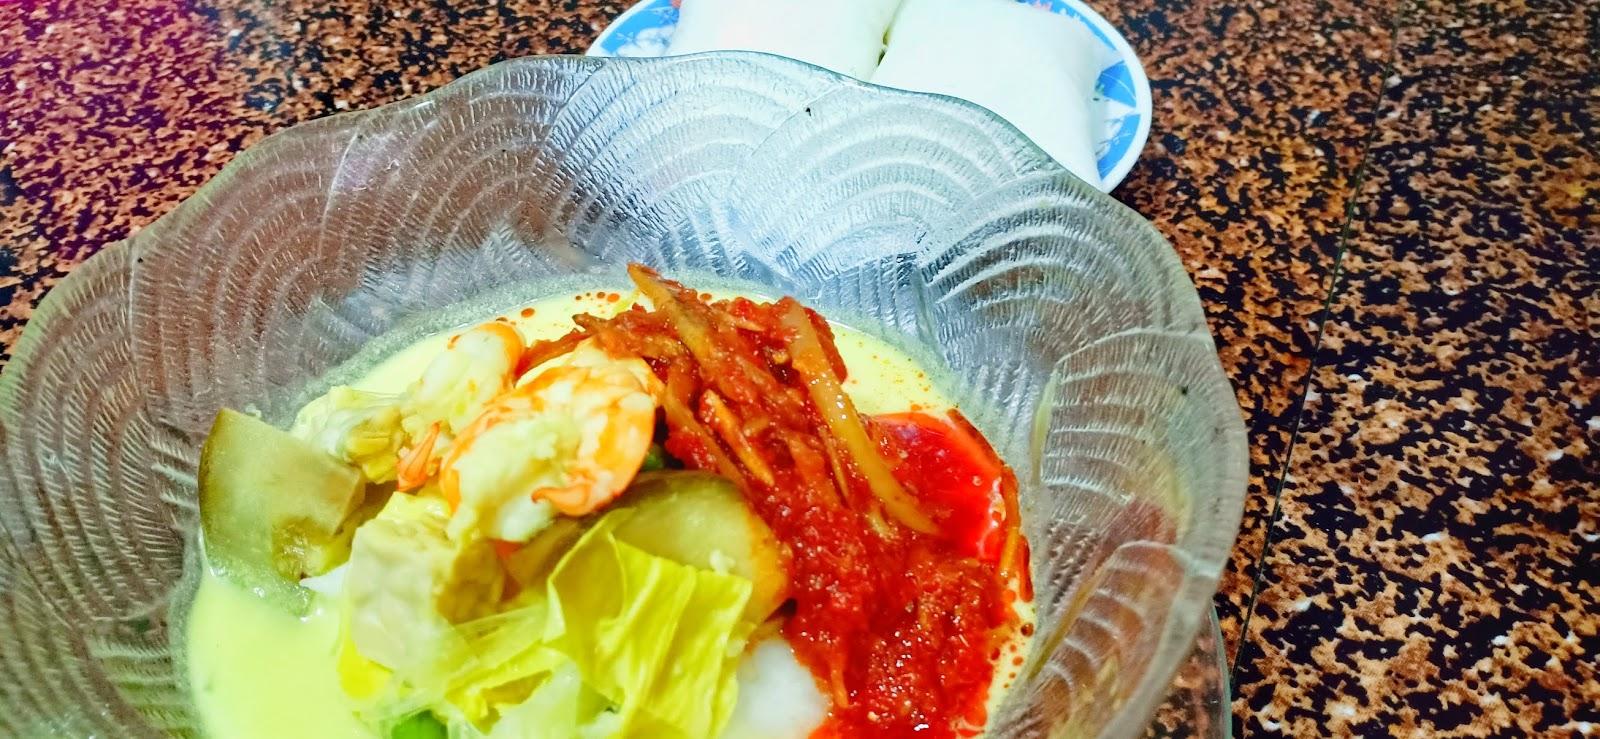 Lontong & Sambal Tumis Ikan Bilis Menu Syawal Ke - 8 | Resepi Lontong Sedap, Simple & Cepat Dimasak